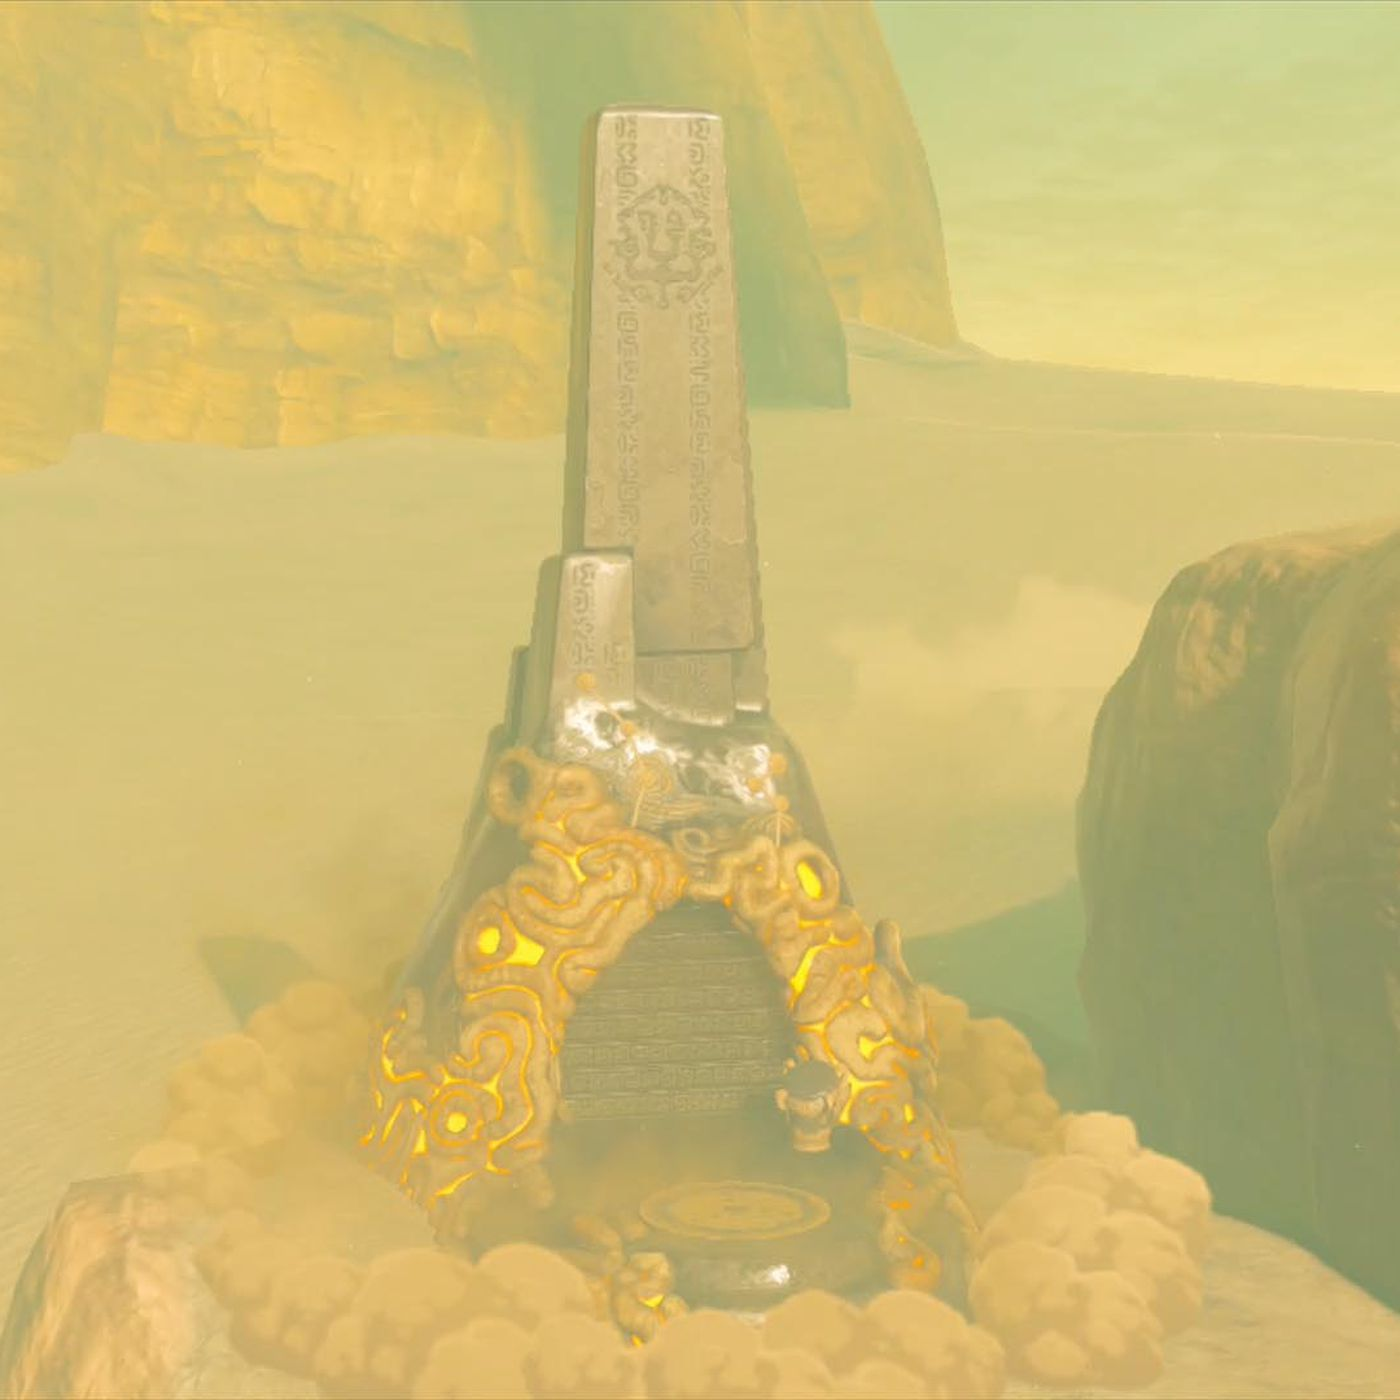 Zelda Breath of the Wild Champions' Ballad guide: Keive Tala